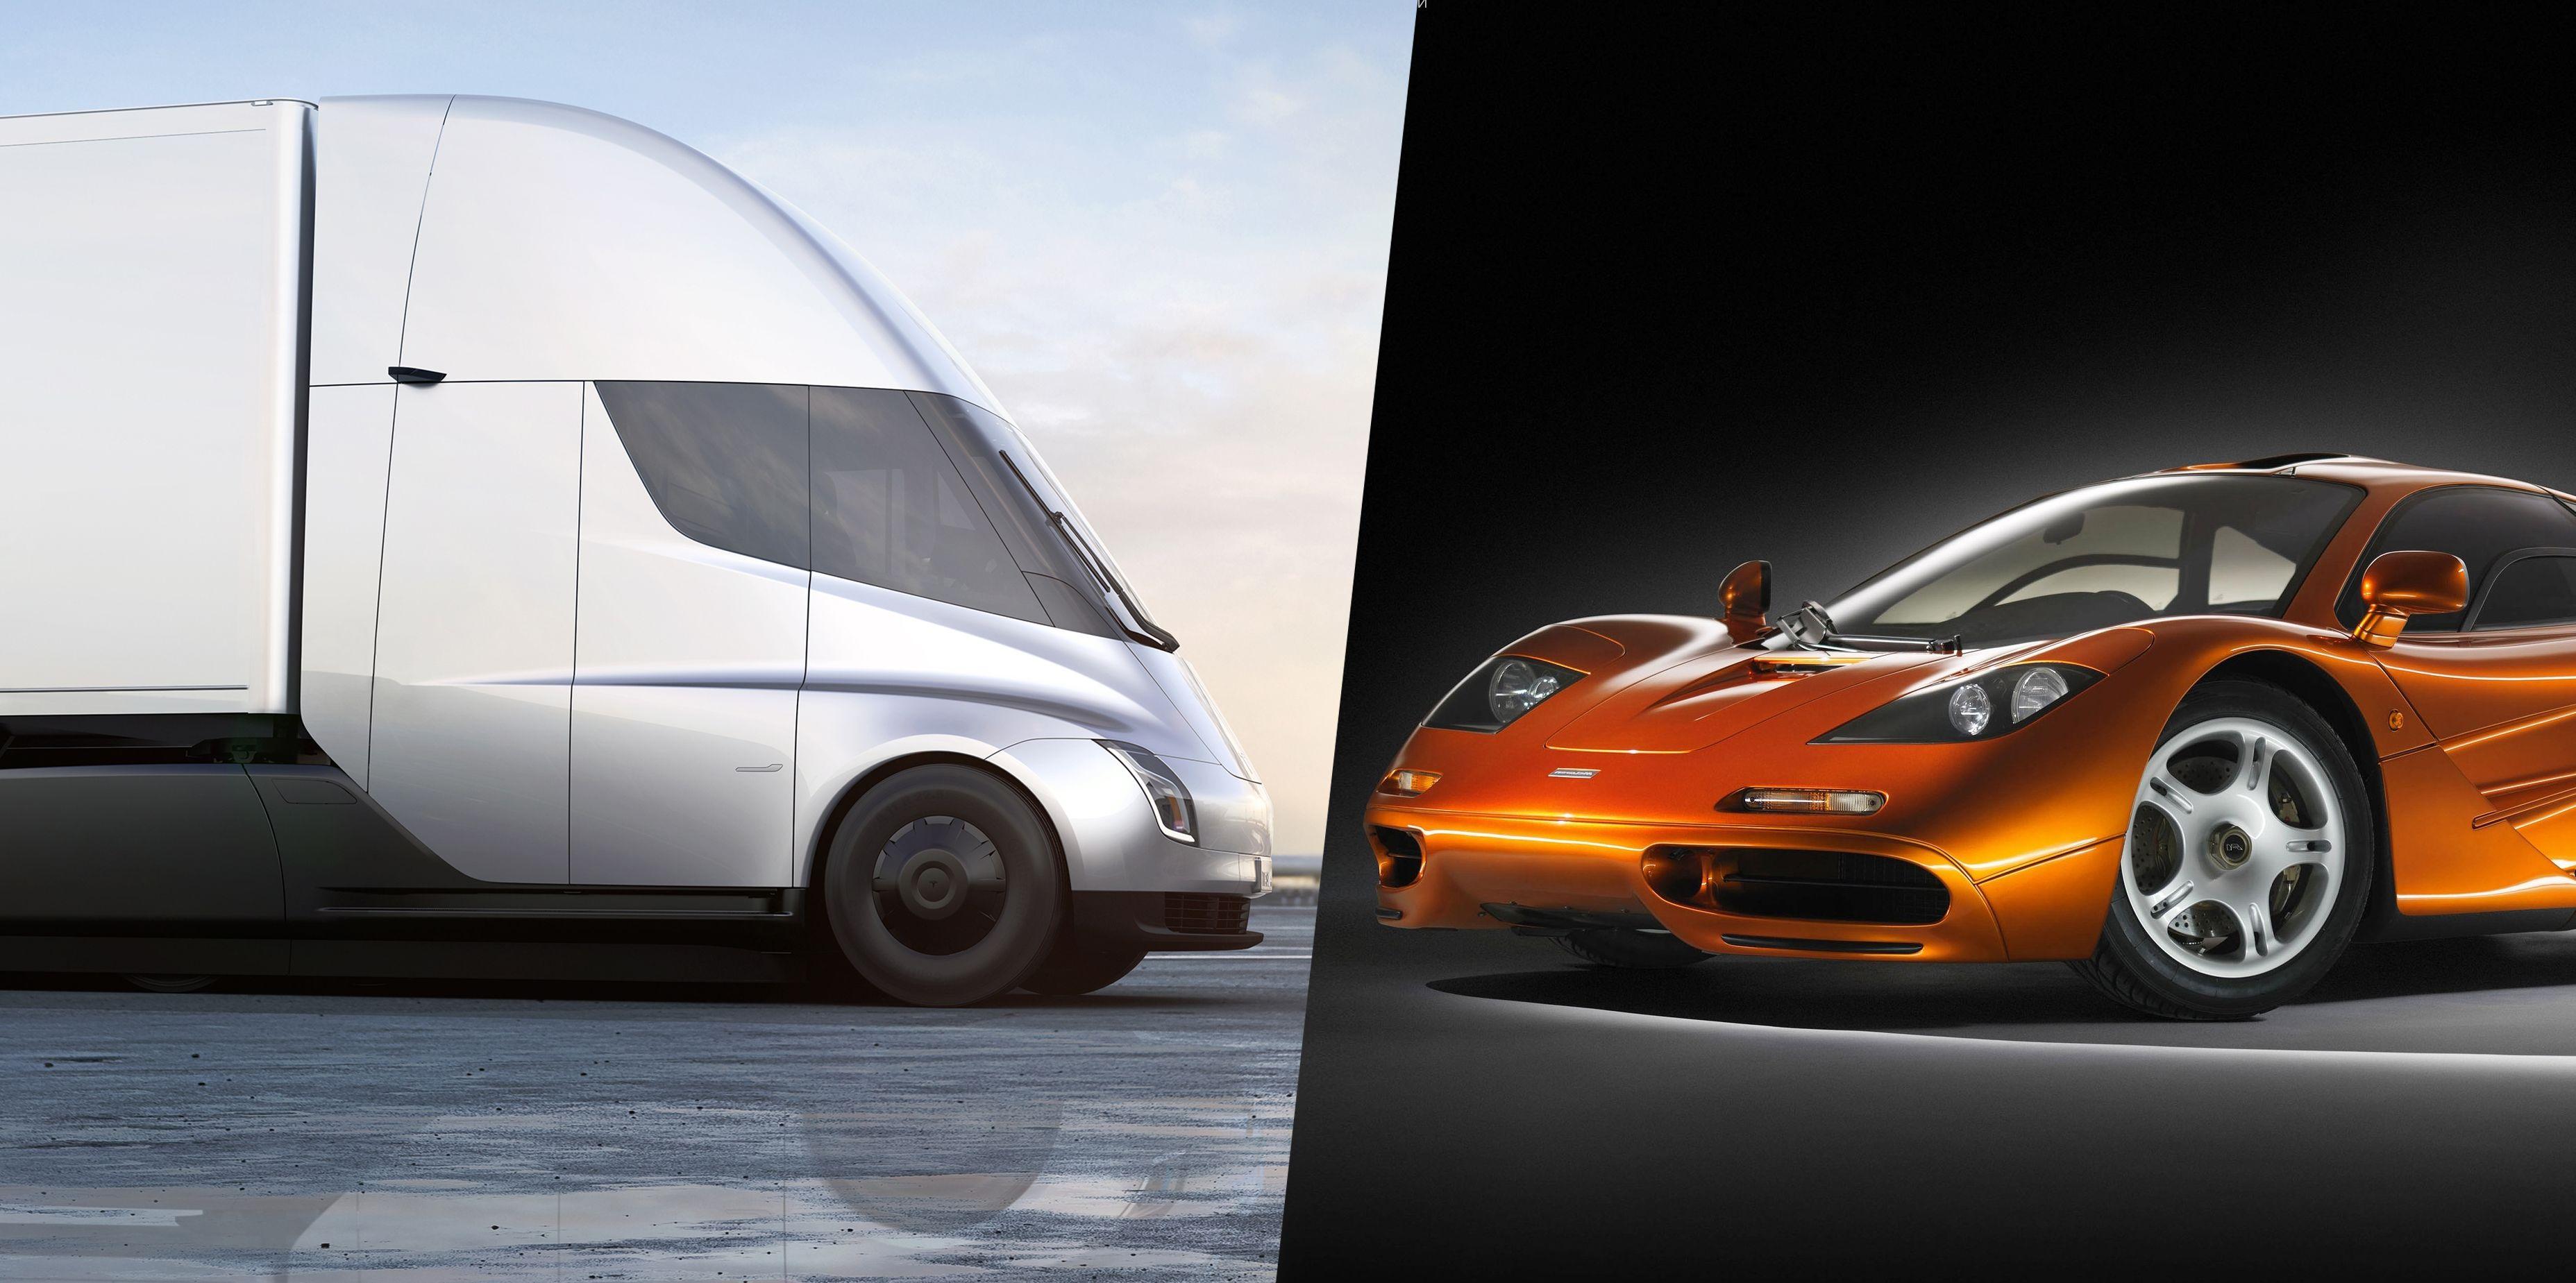 Tesla Electric Truck >> How Tesla's Electric Semi Truck Was Inspired by Elon Musk's McLaren F1